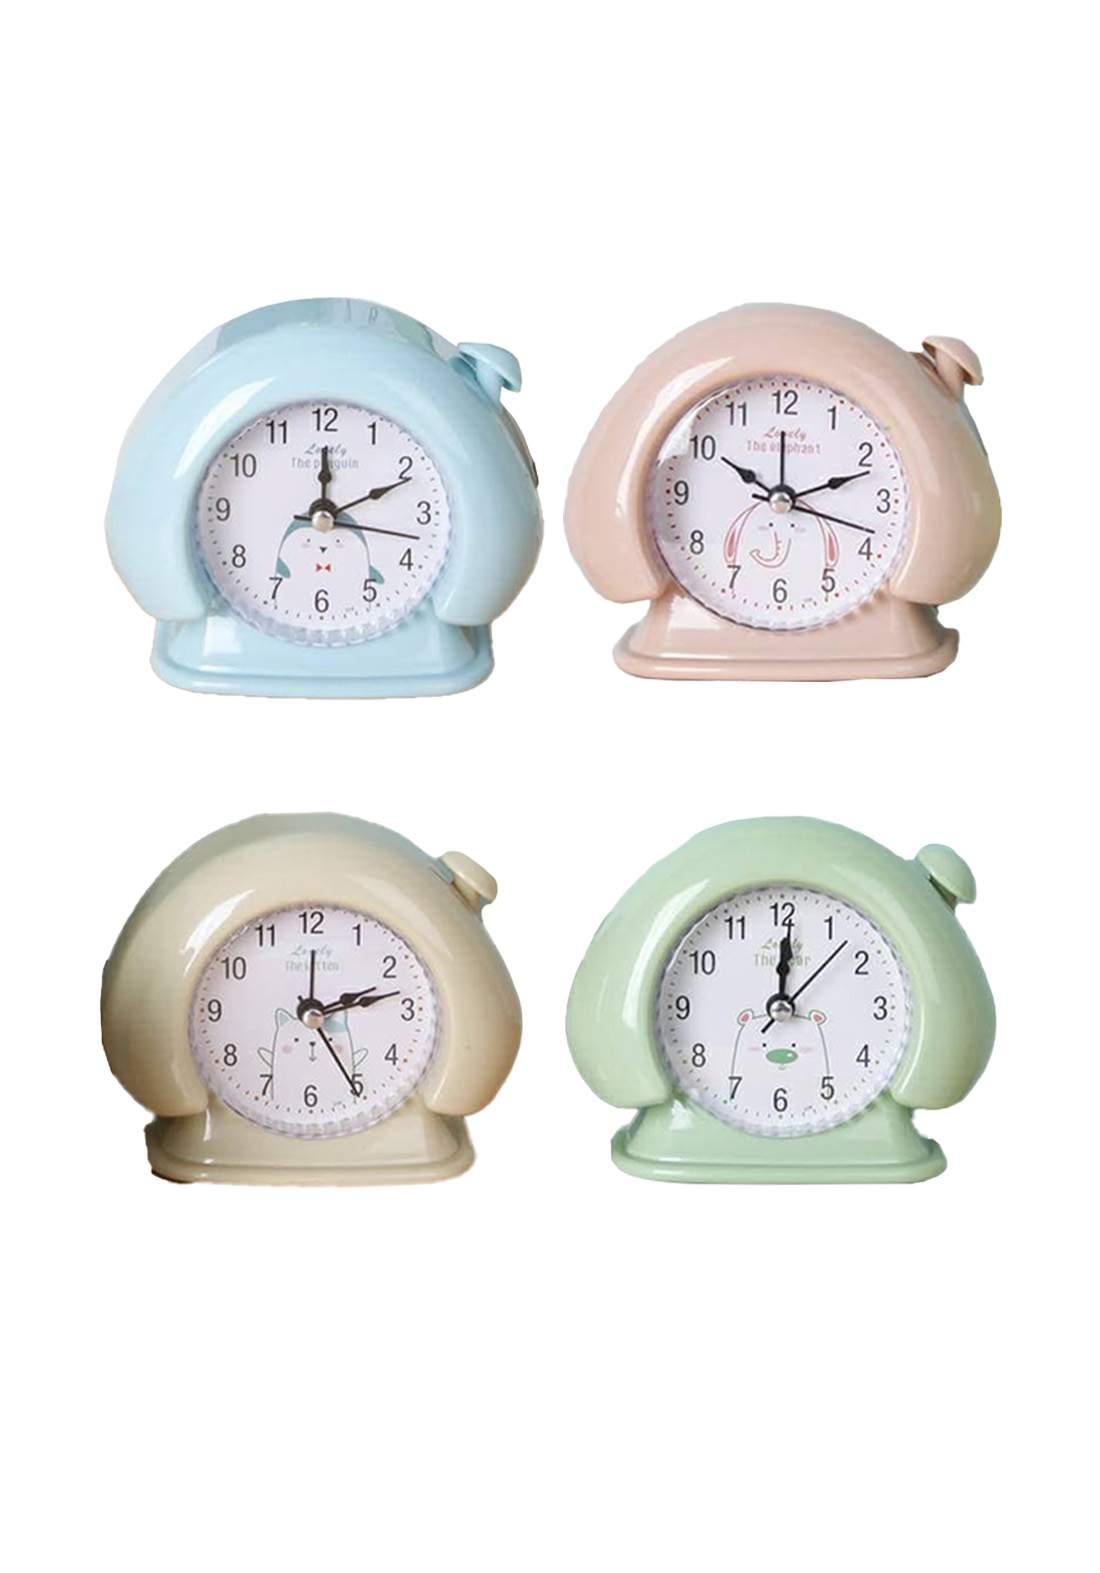 Round Double Bell Alarm Cloc'k ساعة منضدية